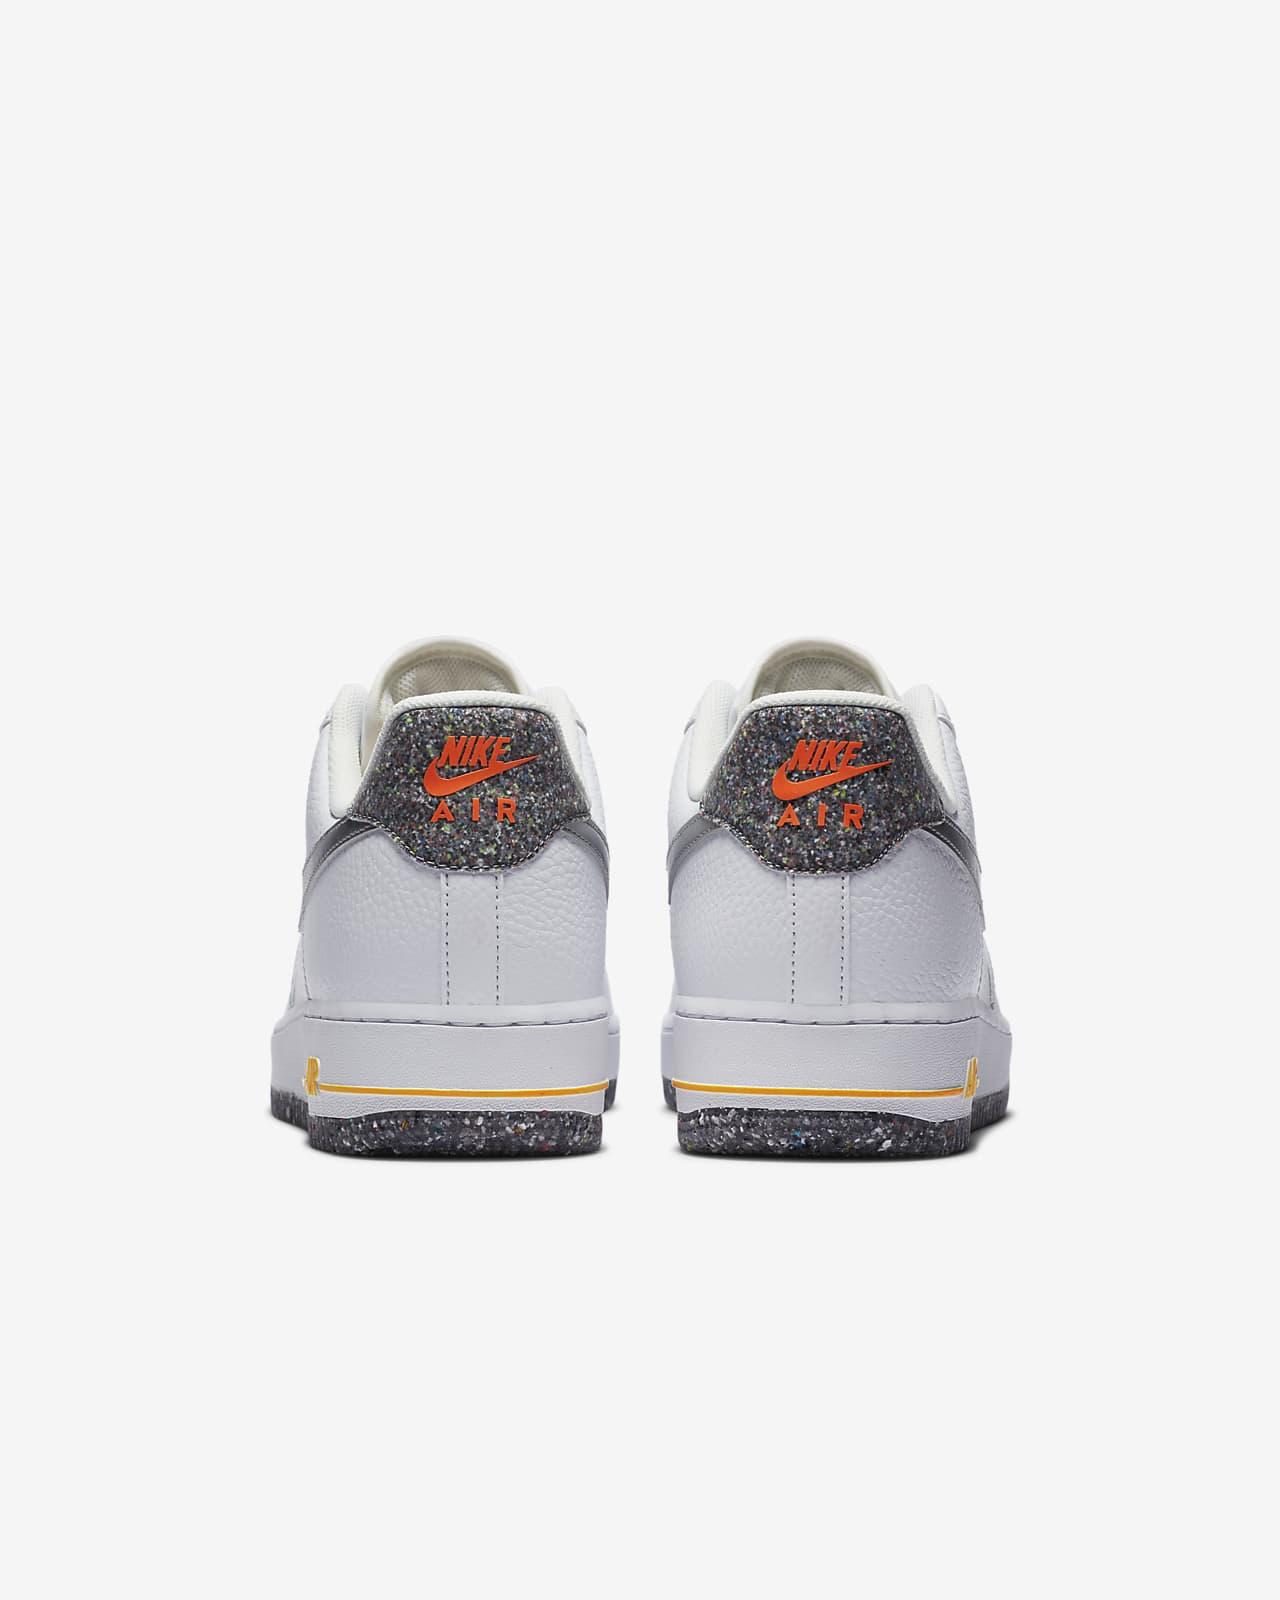 nike air force 1 07 scarpe da basket uomo